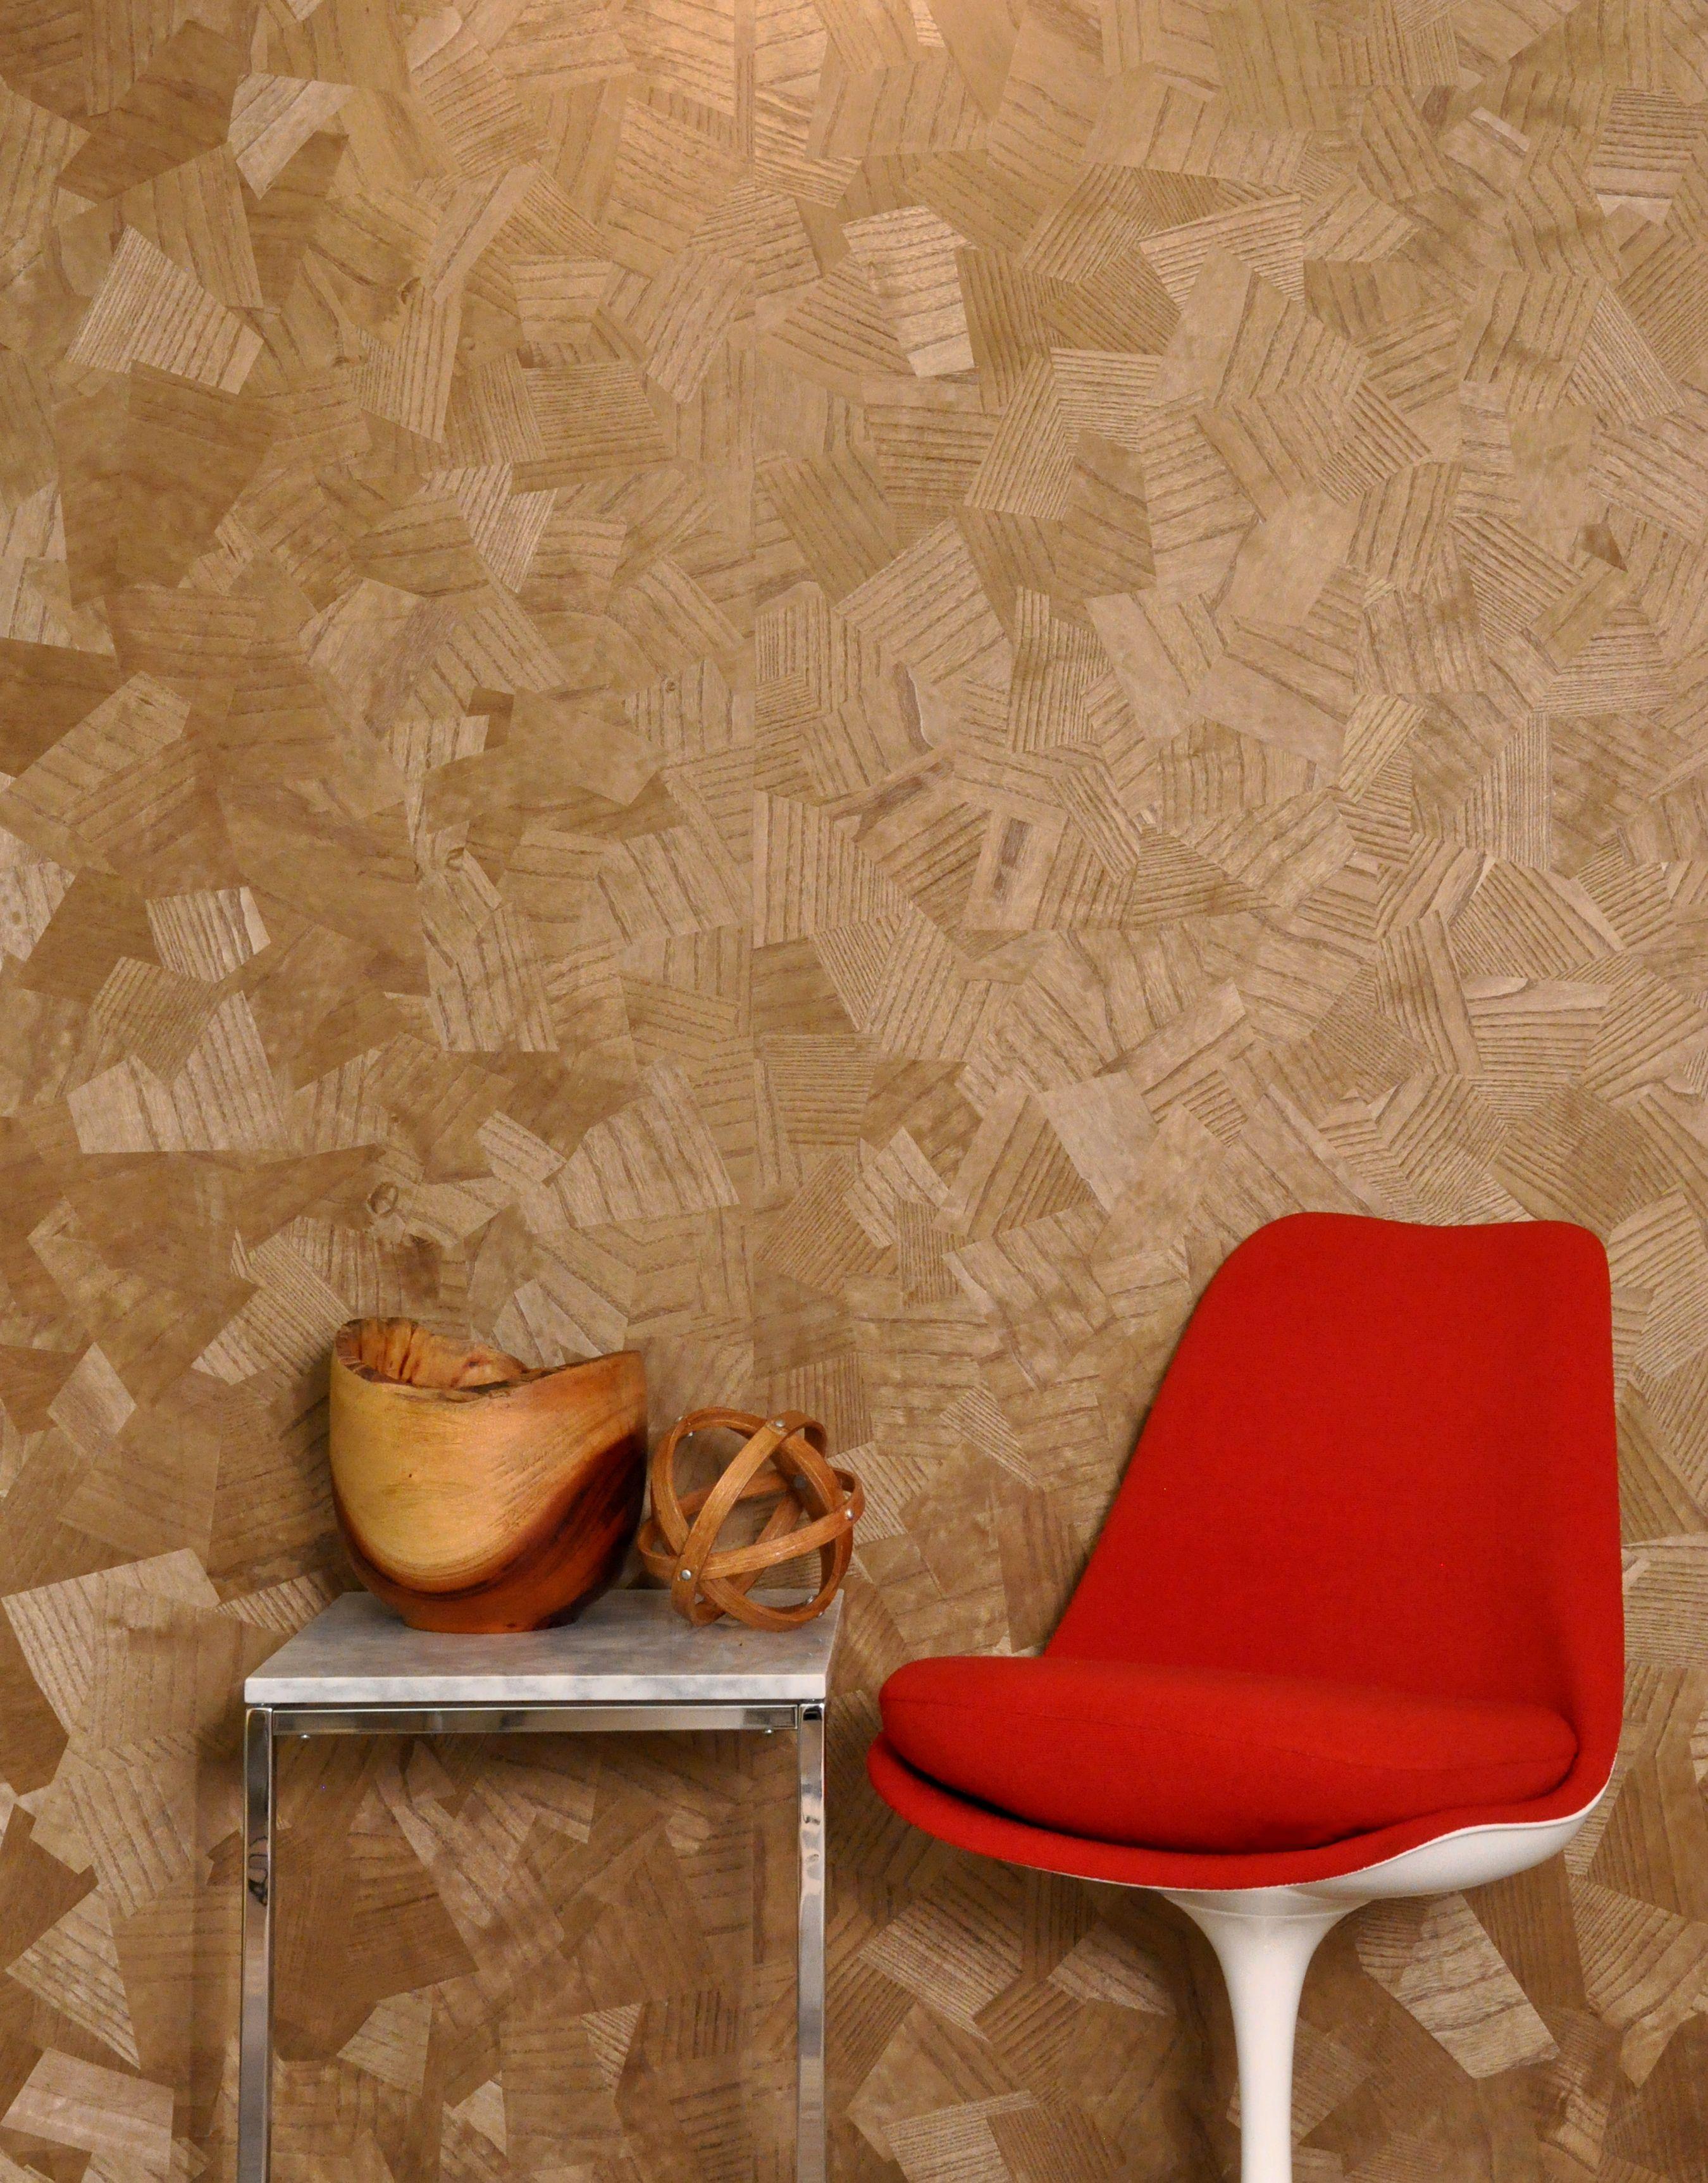 google office usa wallpaper. origami innovationsusa wallpaper google office usa t